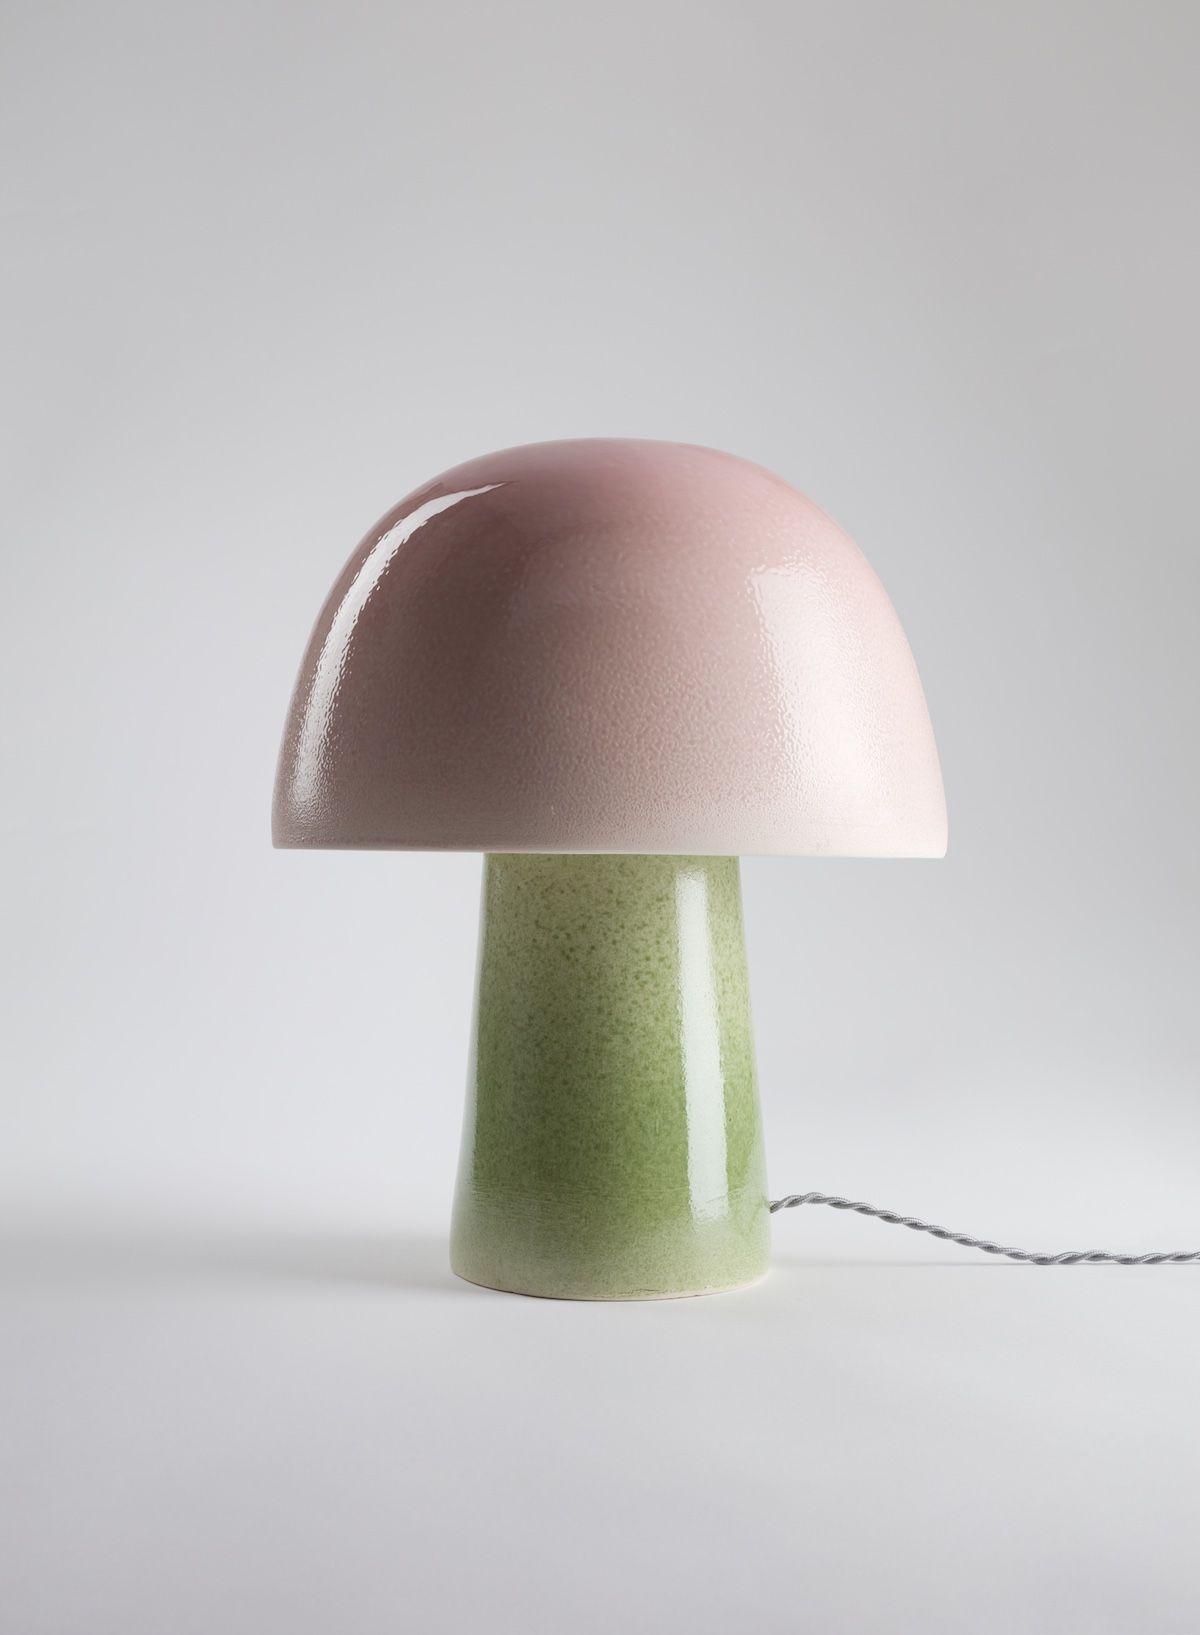 7f5f0d7b5c311146fdba0715aeb72ea4 Résultat Supérieur 60 Beau Lampe Cloche Galerie 2018 Hdj5